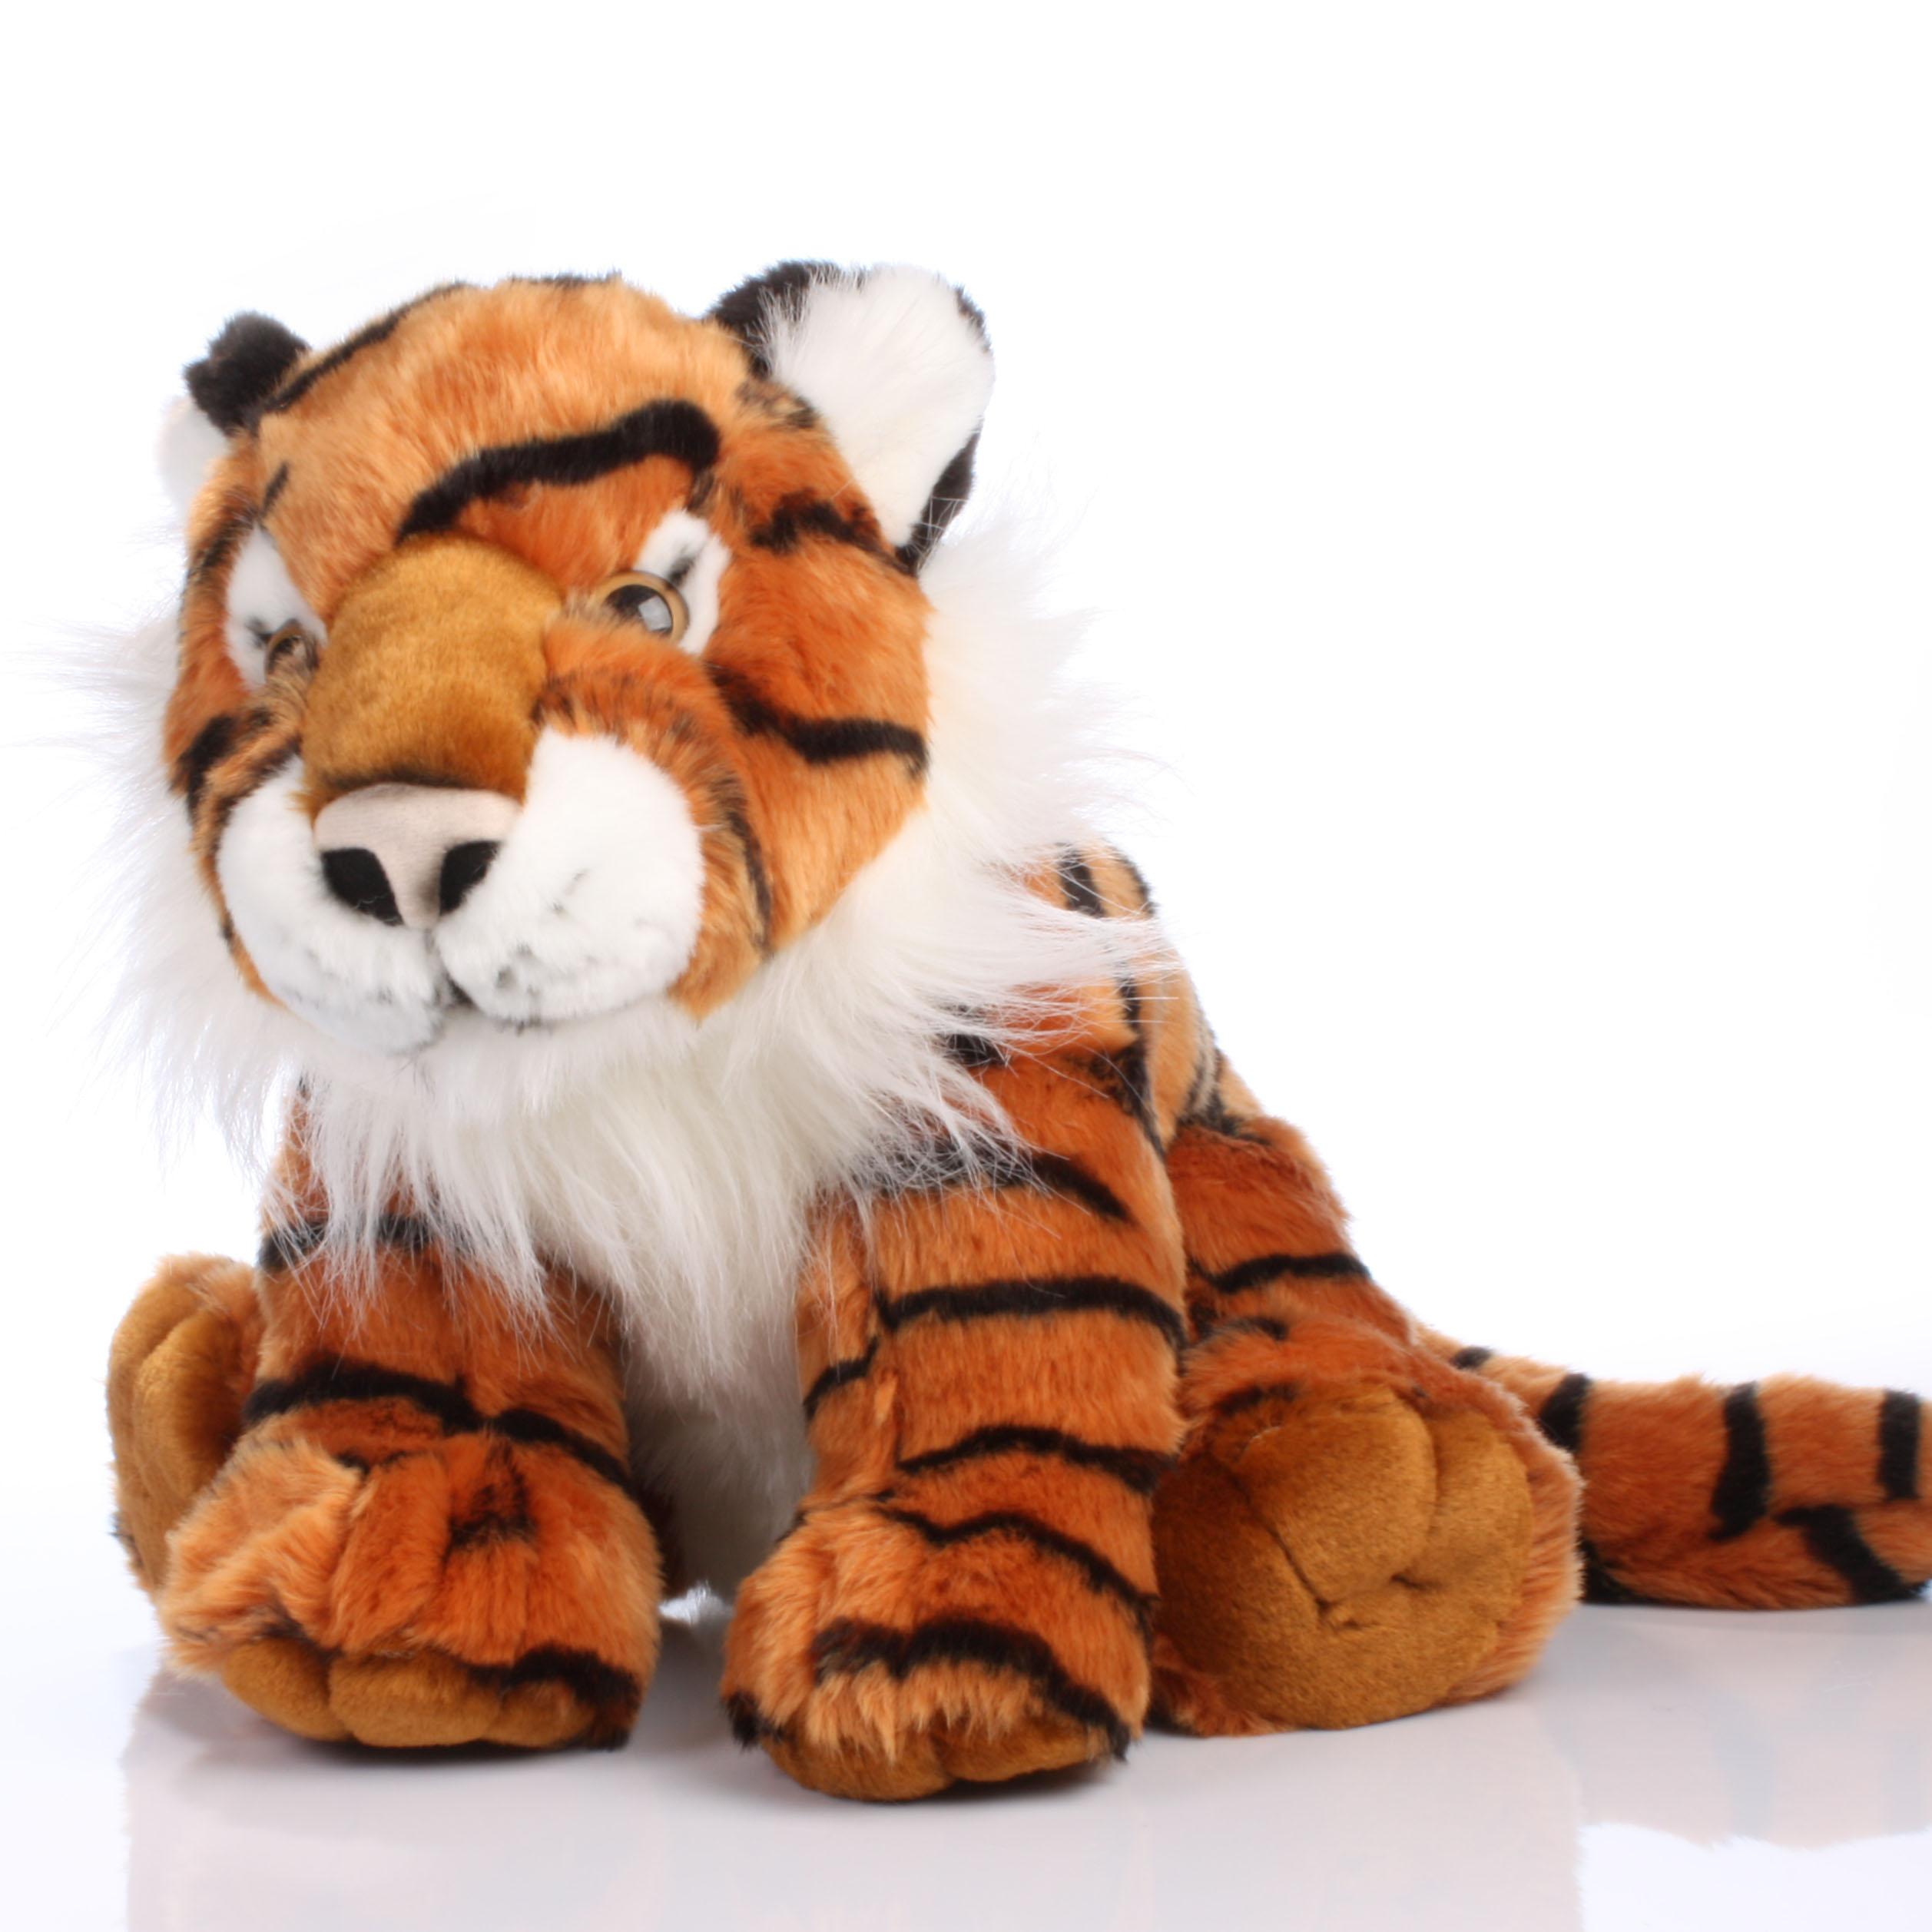 Cuddly Tiger - Cuddly Gifts